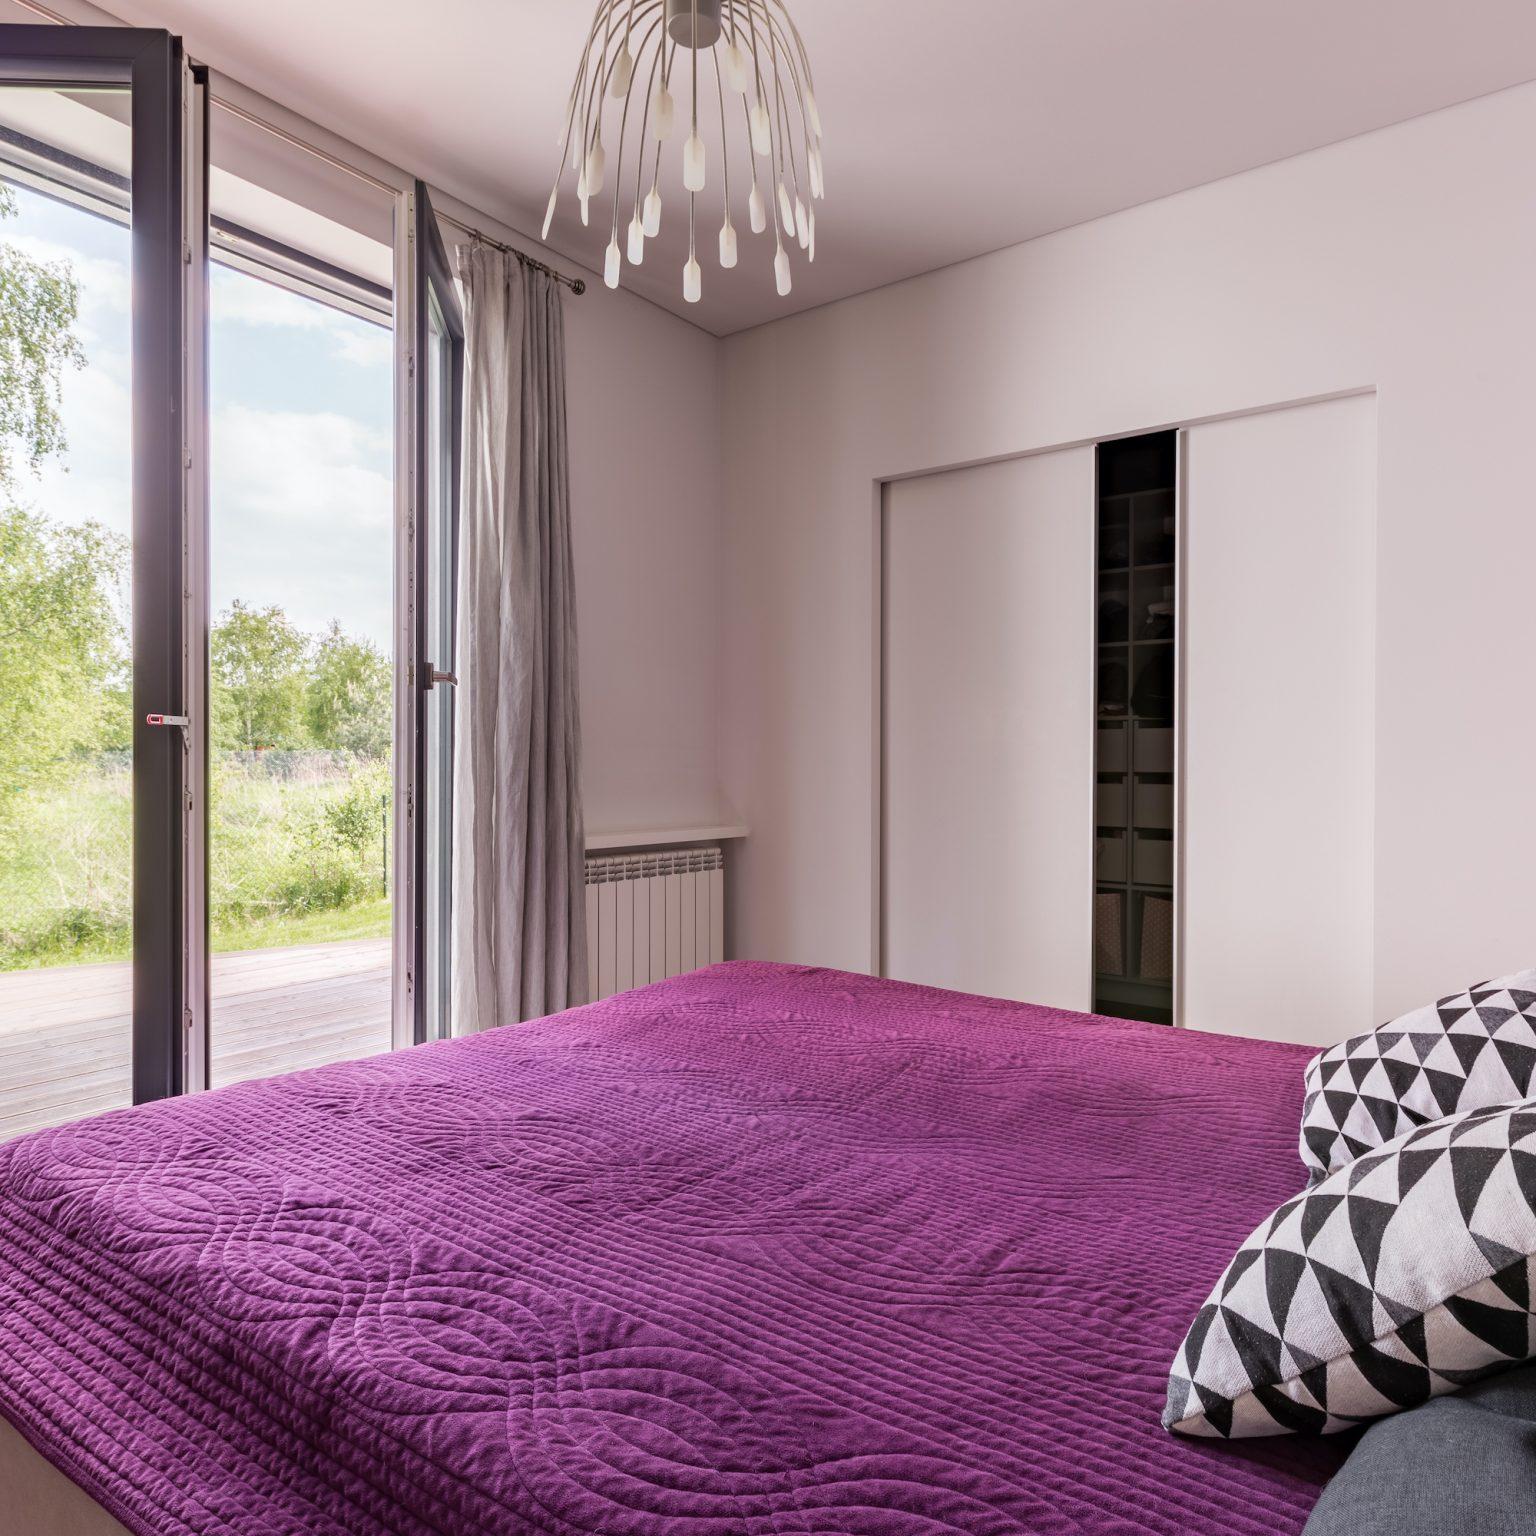 residential doors in a bedroom